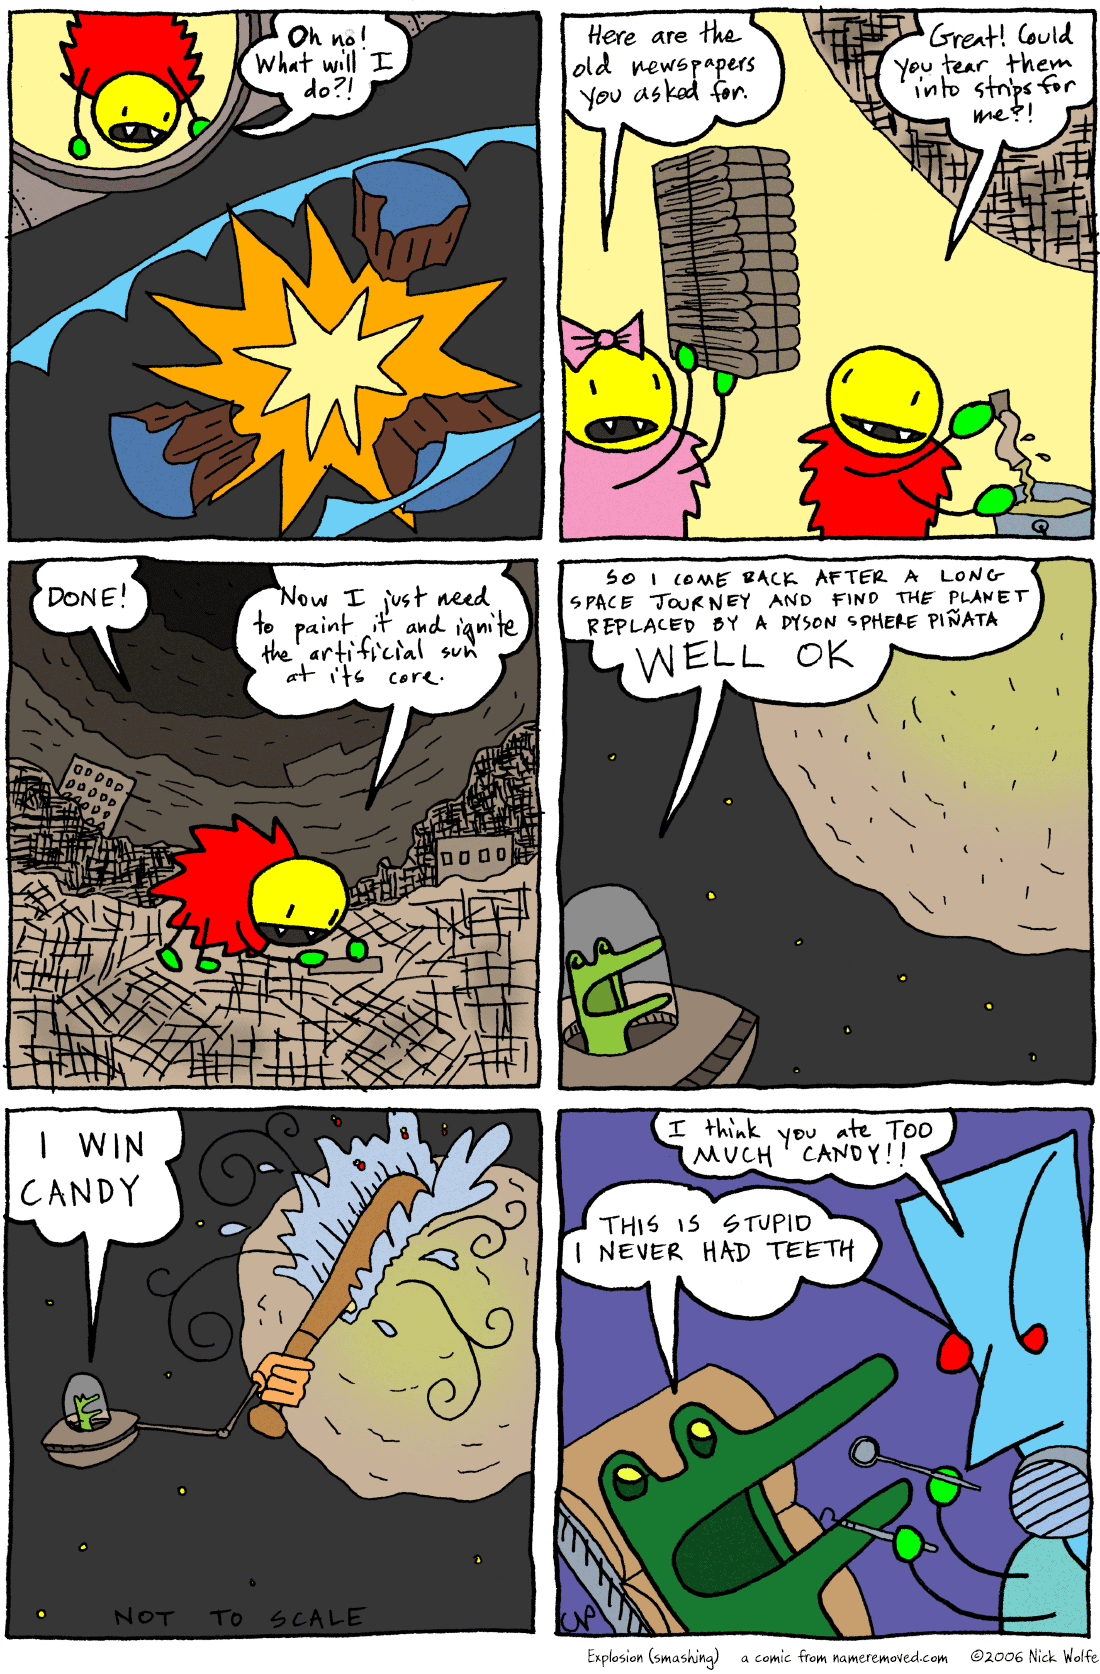 Explosion (smashing)